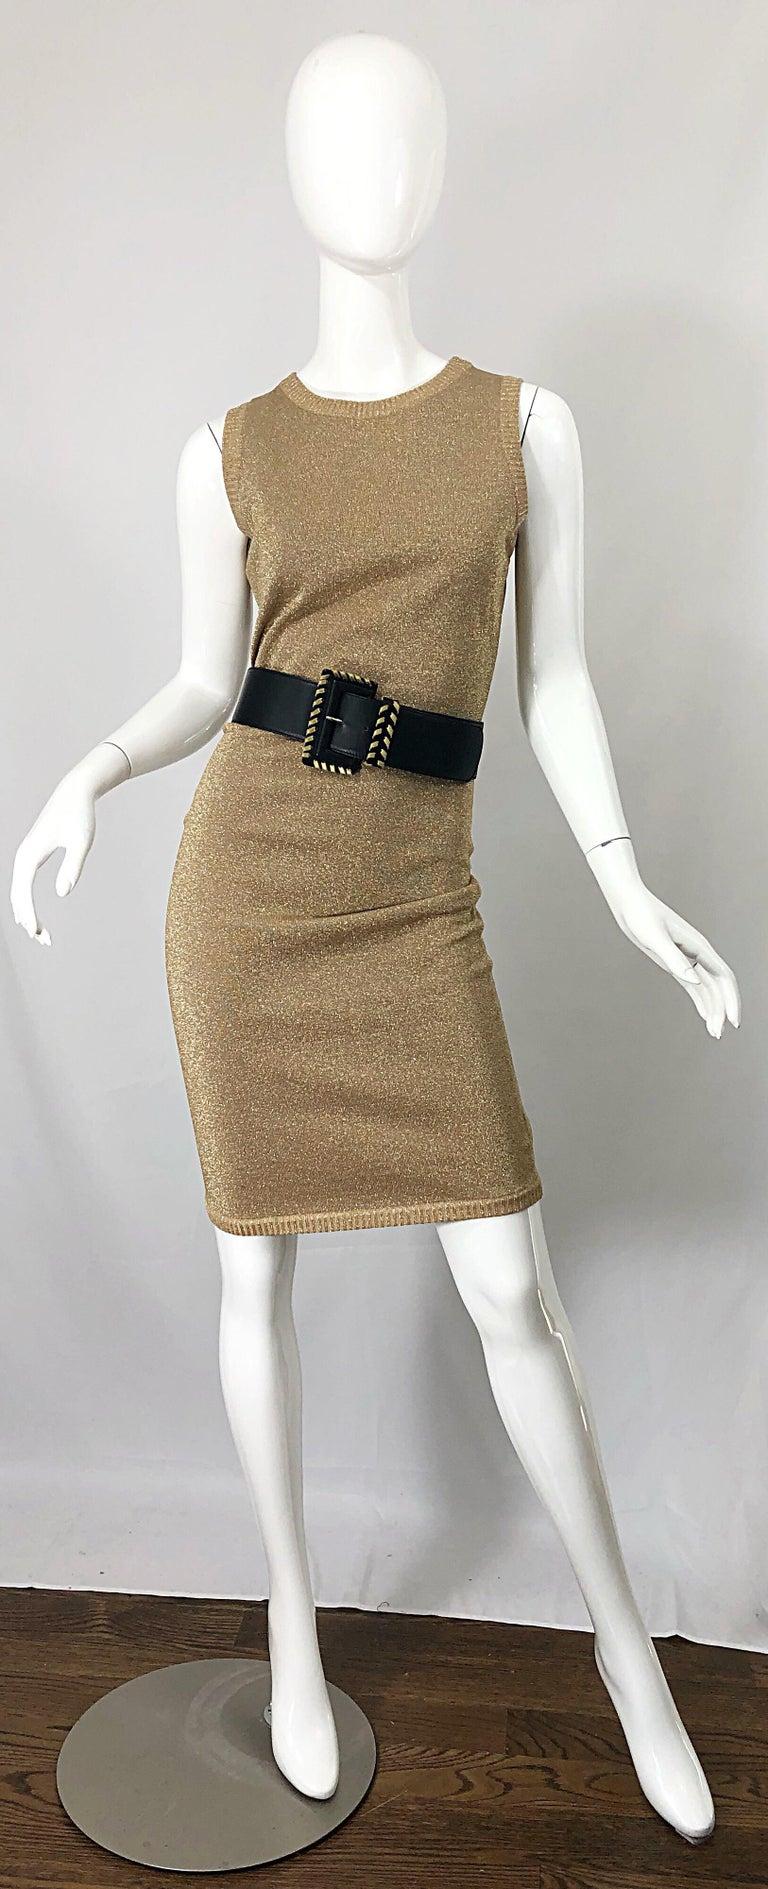 Women's Mila Schoon 1990s Gold Metallic Cut - Out Back Vintage 90s Bodycon Dress For Sale